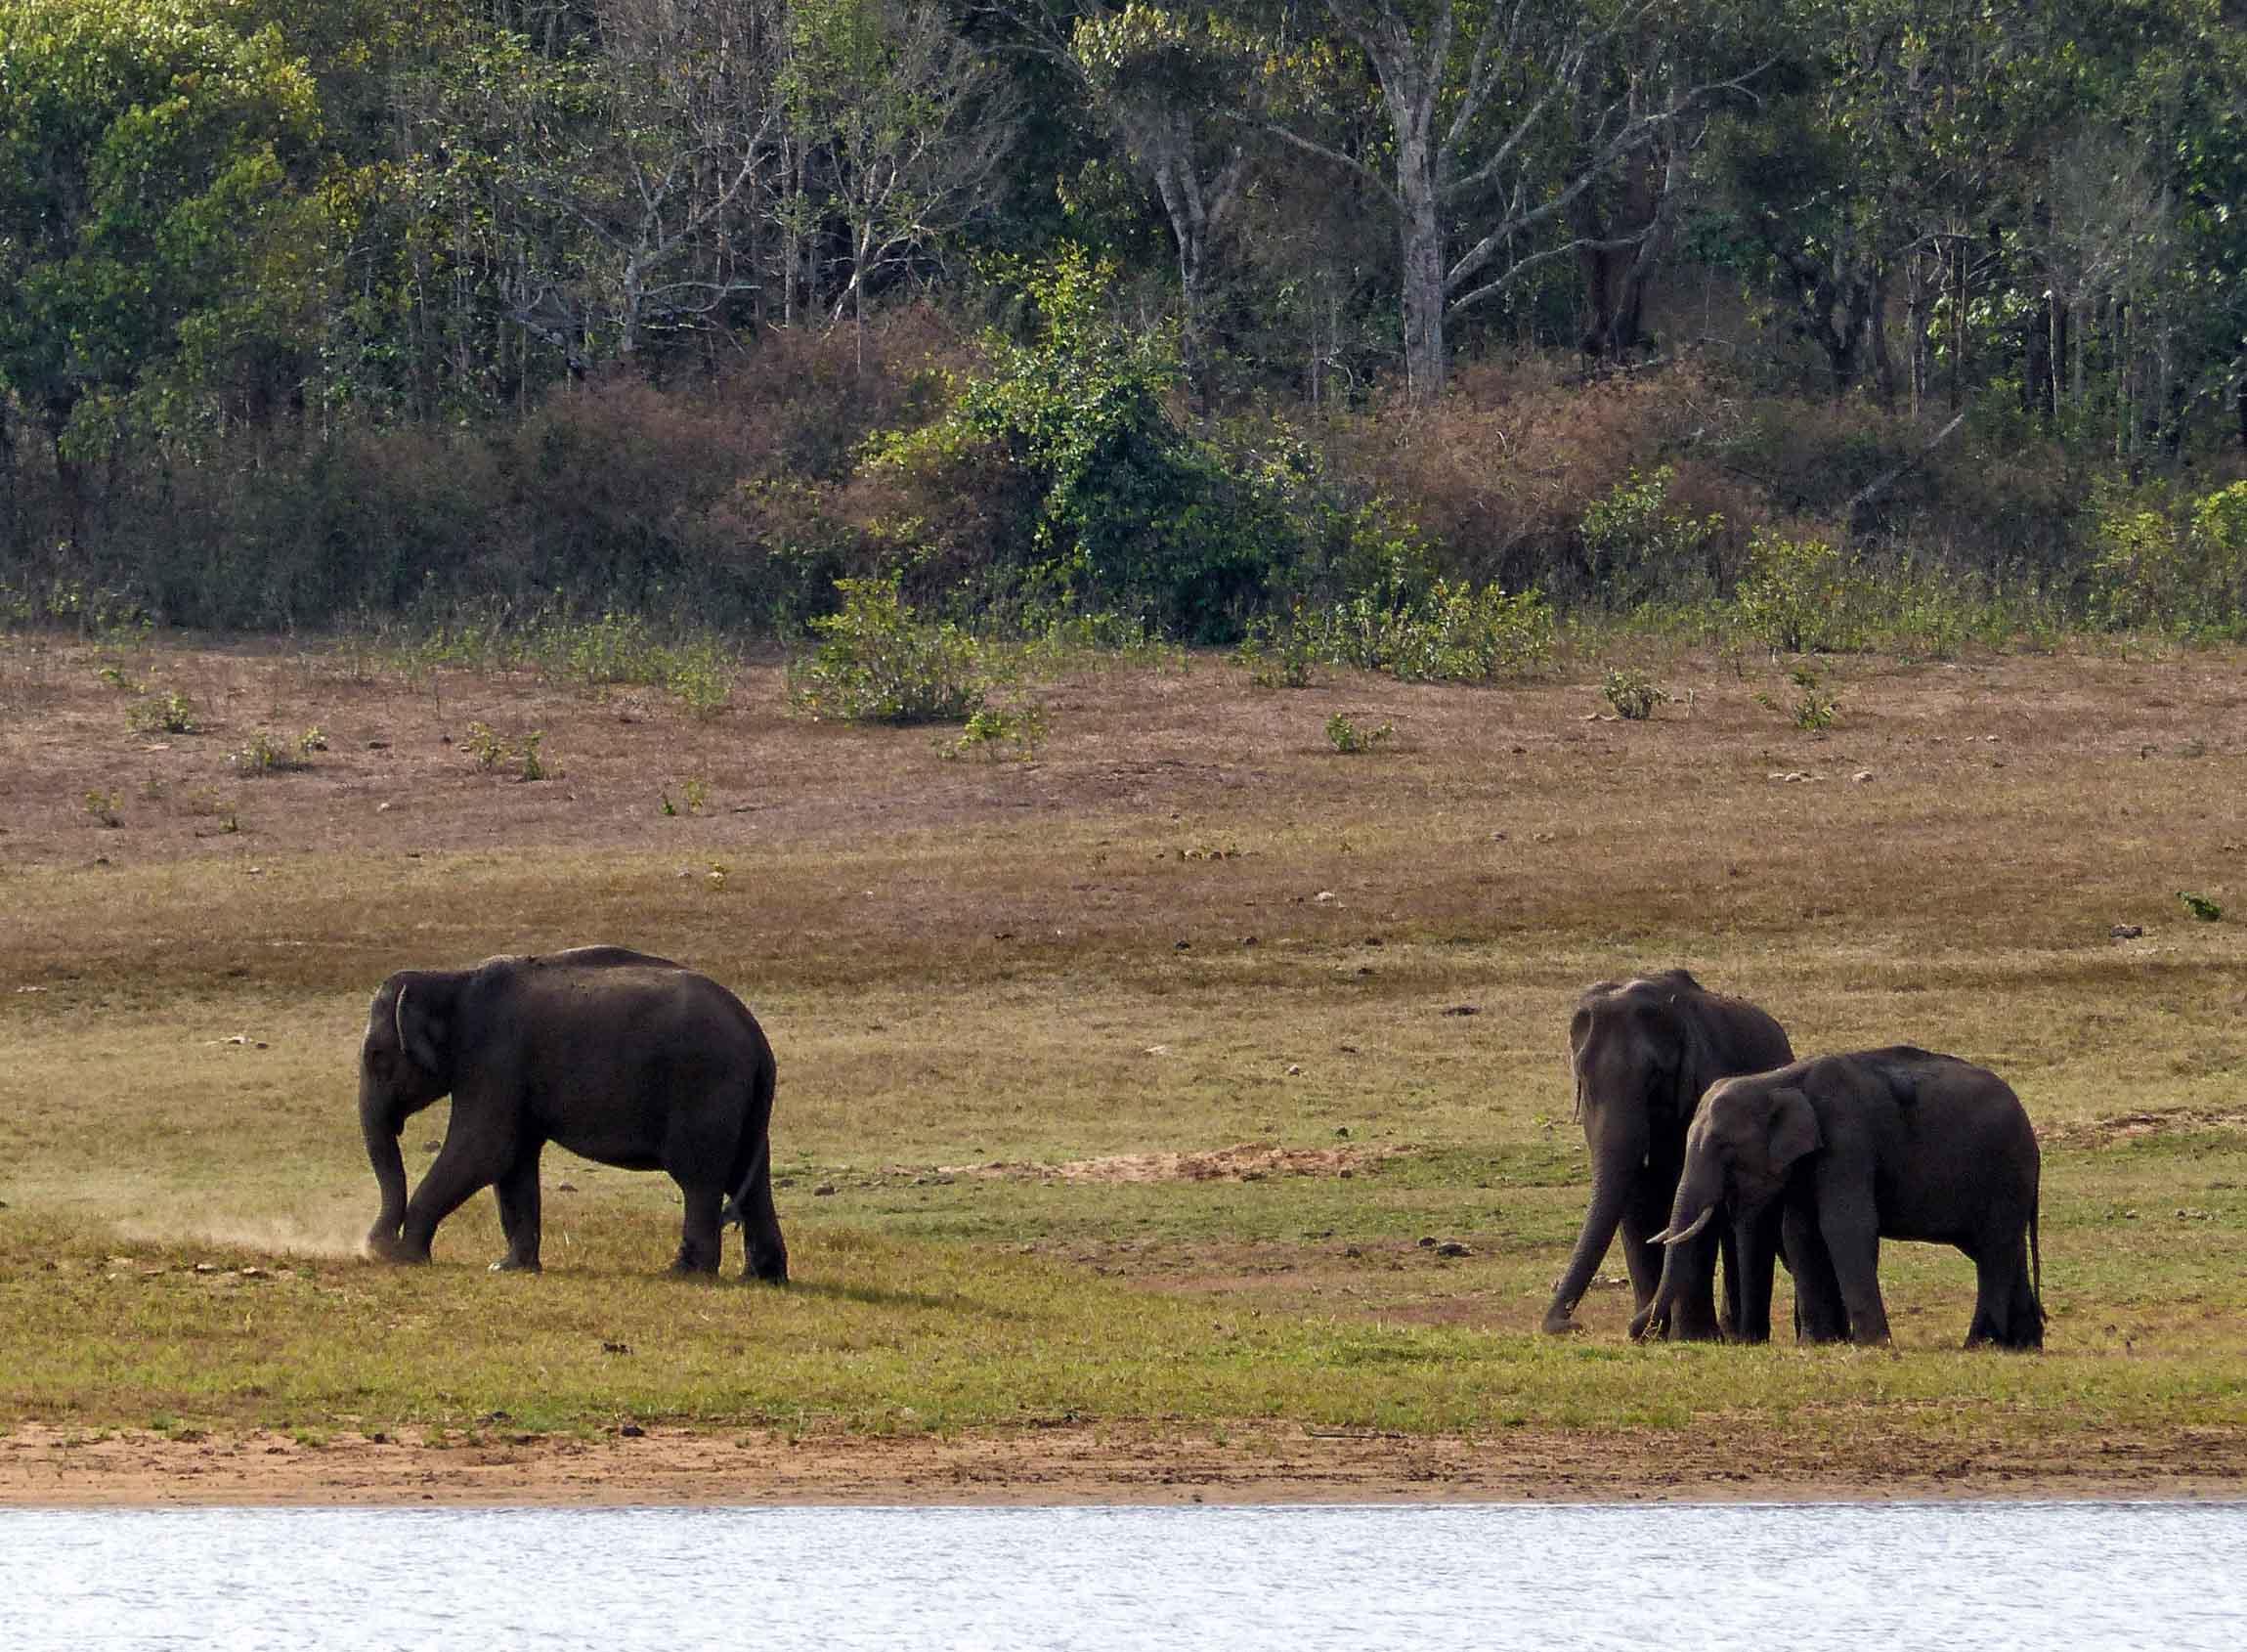 Three elephants on the bank of a lake